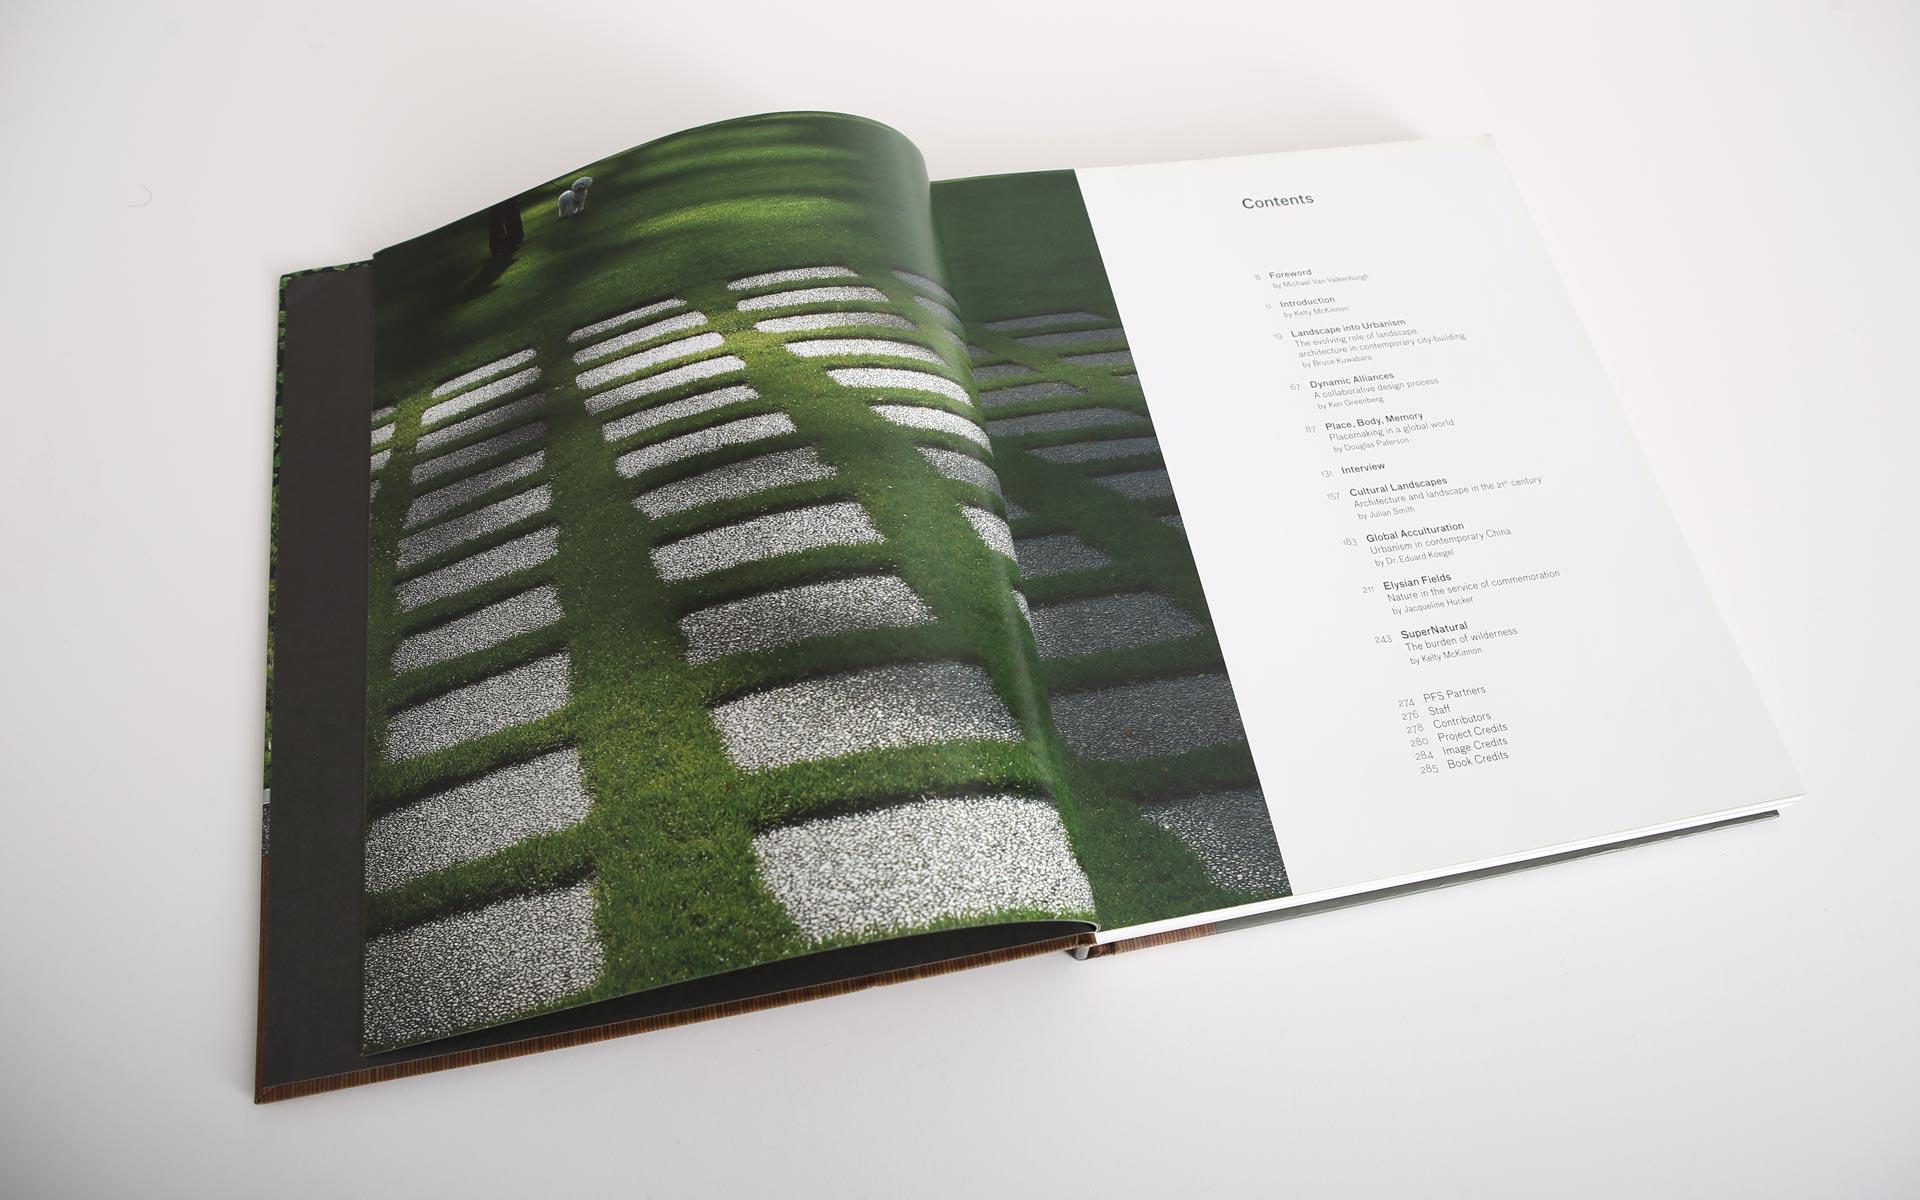 pfs-landscape-architects-book-design-2